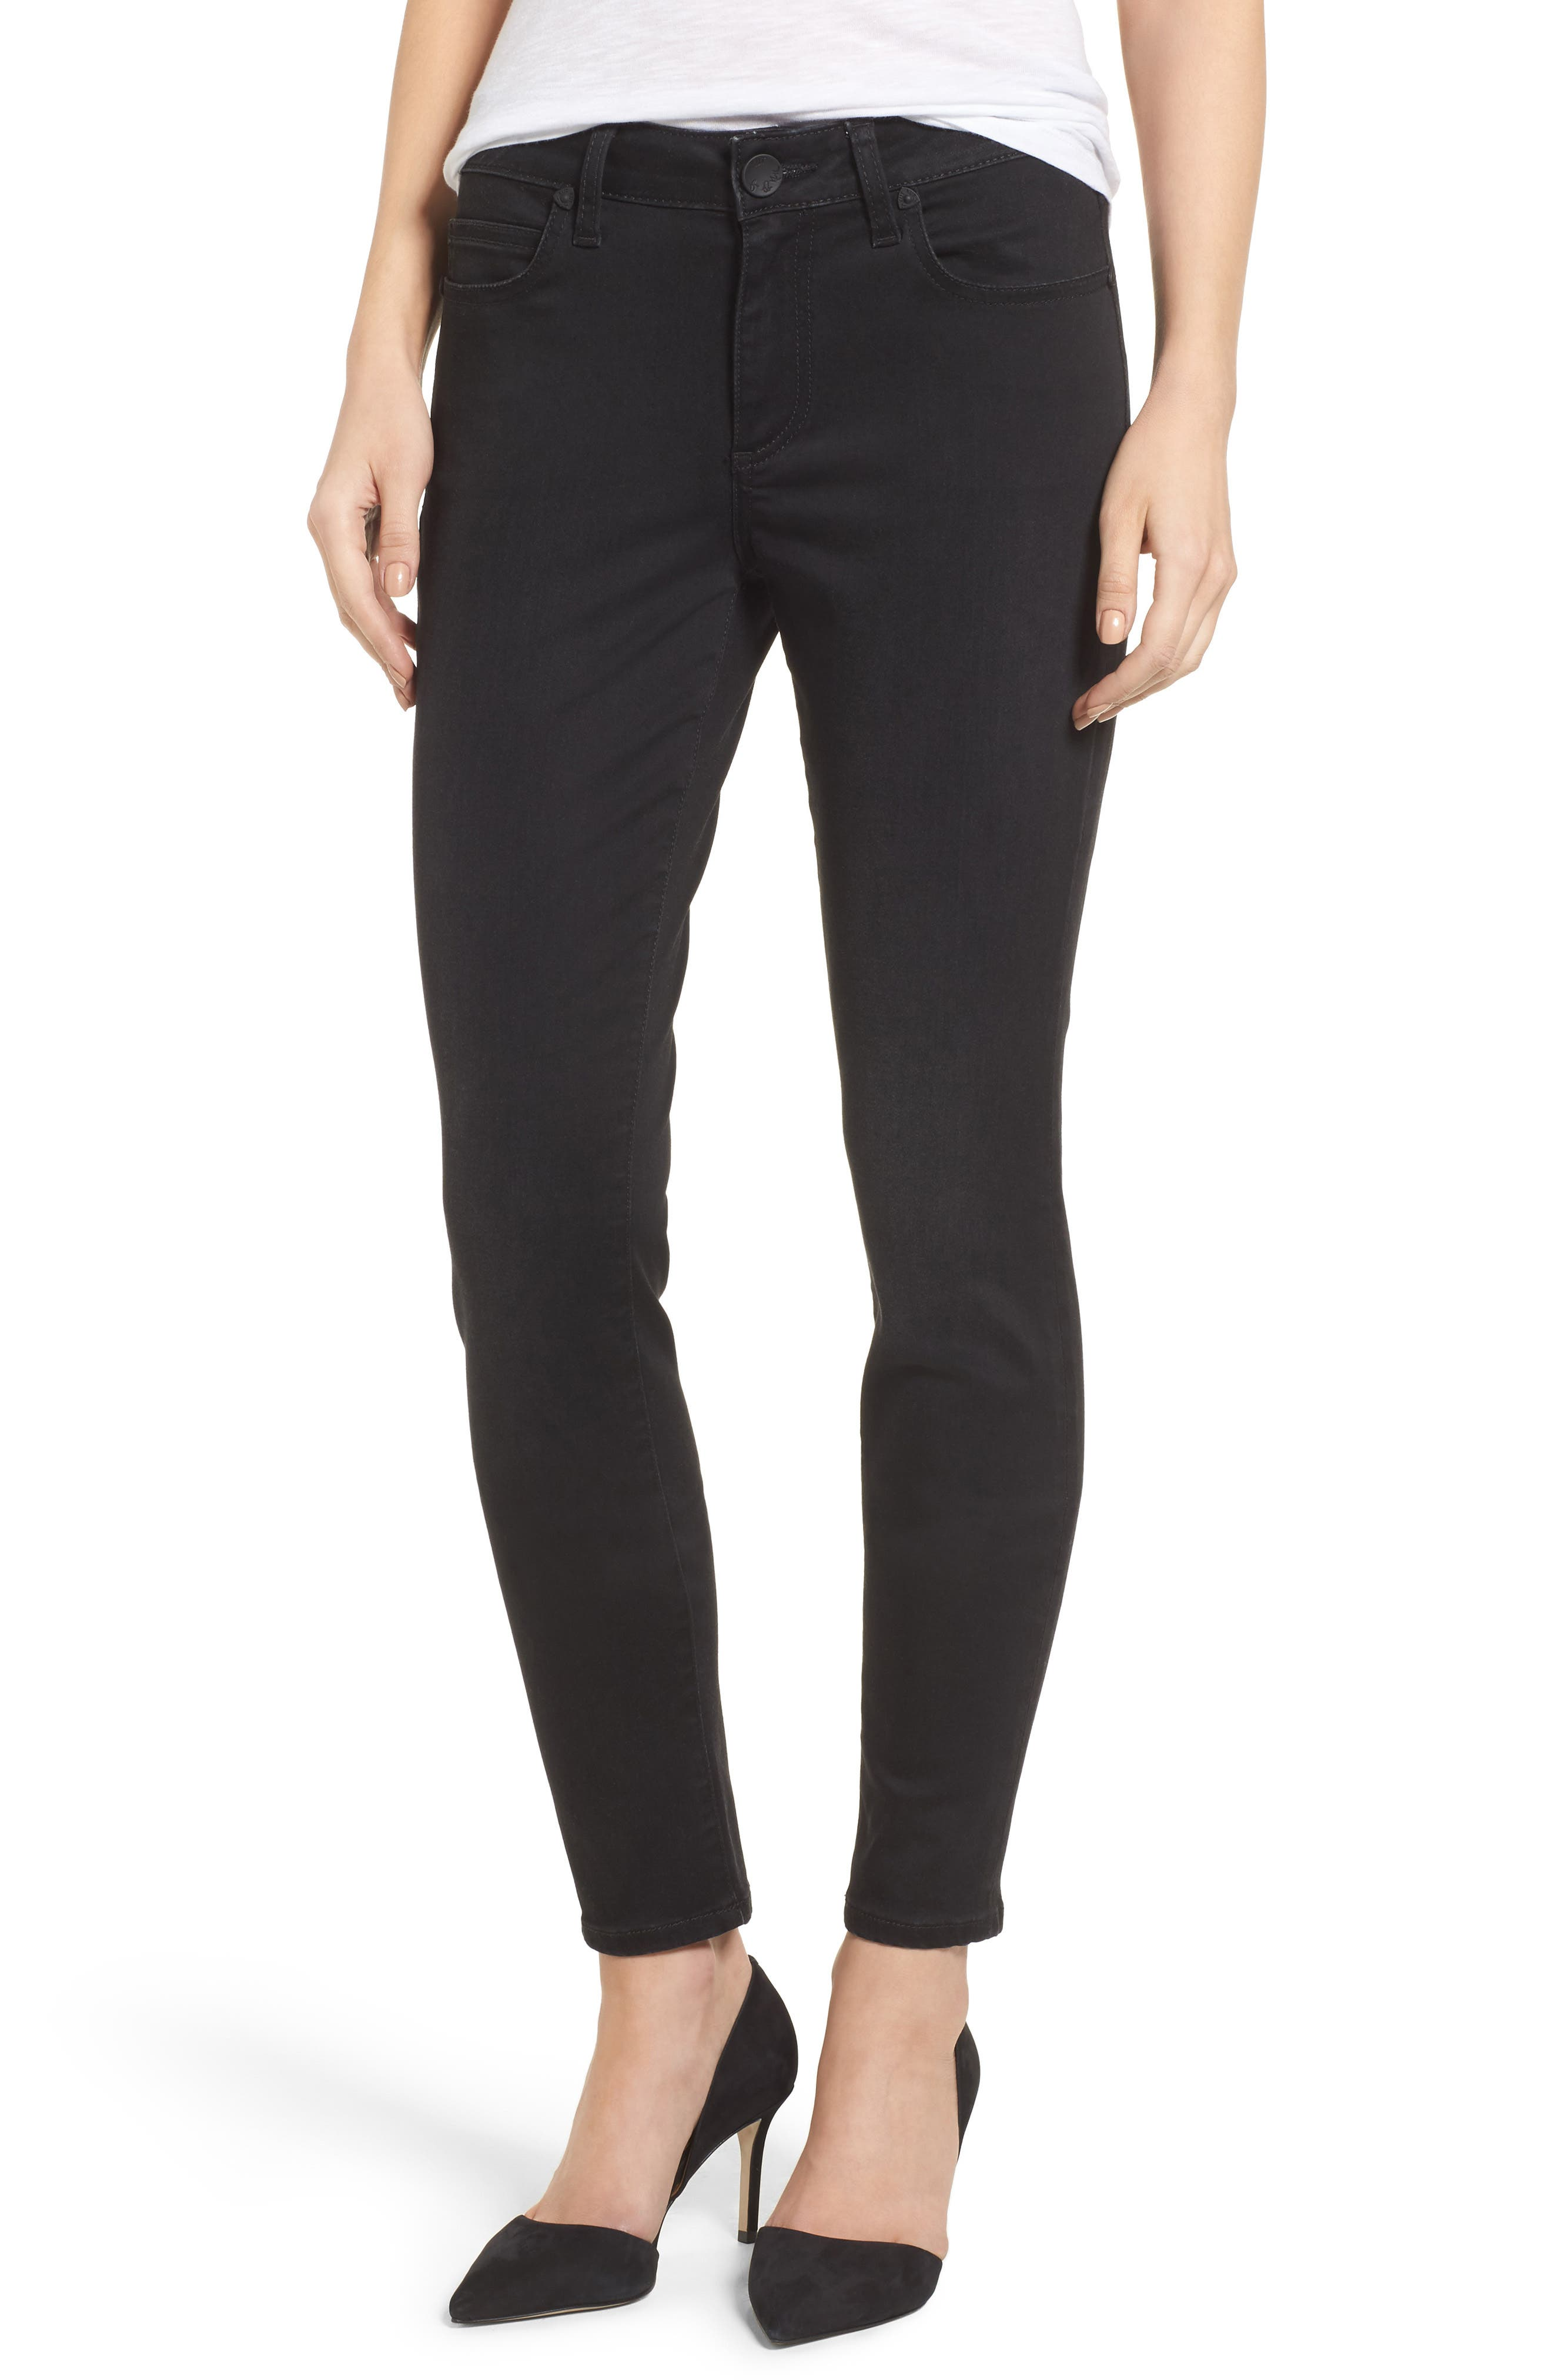 Main Image - KUT from the Kloth Mia Curvy Fit Skinny Jeans (Regular & Petite)